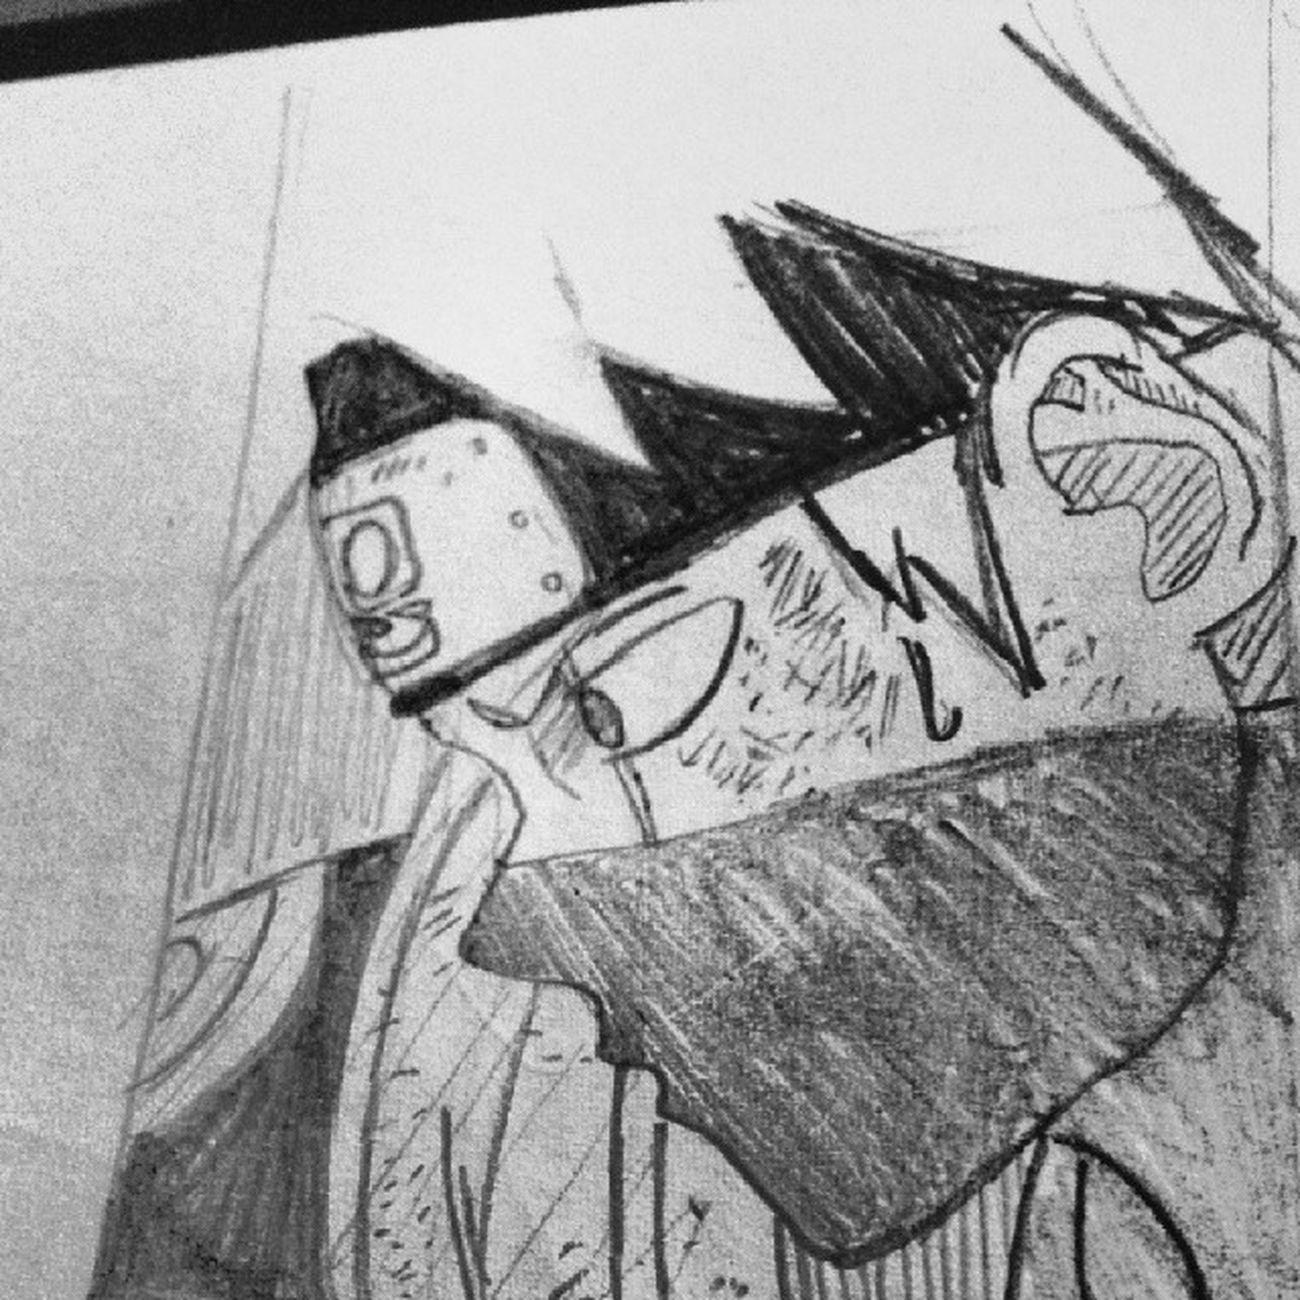 Drawing Men Kakashi Hatake Ninja of Konoha Creative Work Art Manga Picture War Arc Warrior Fighter Sketch Naruto Universum Part of Team7 Fight